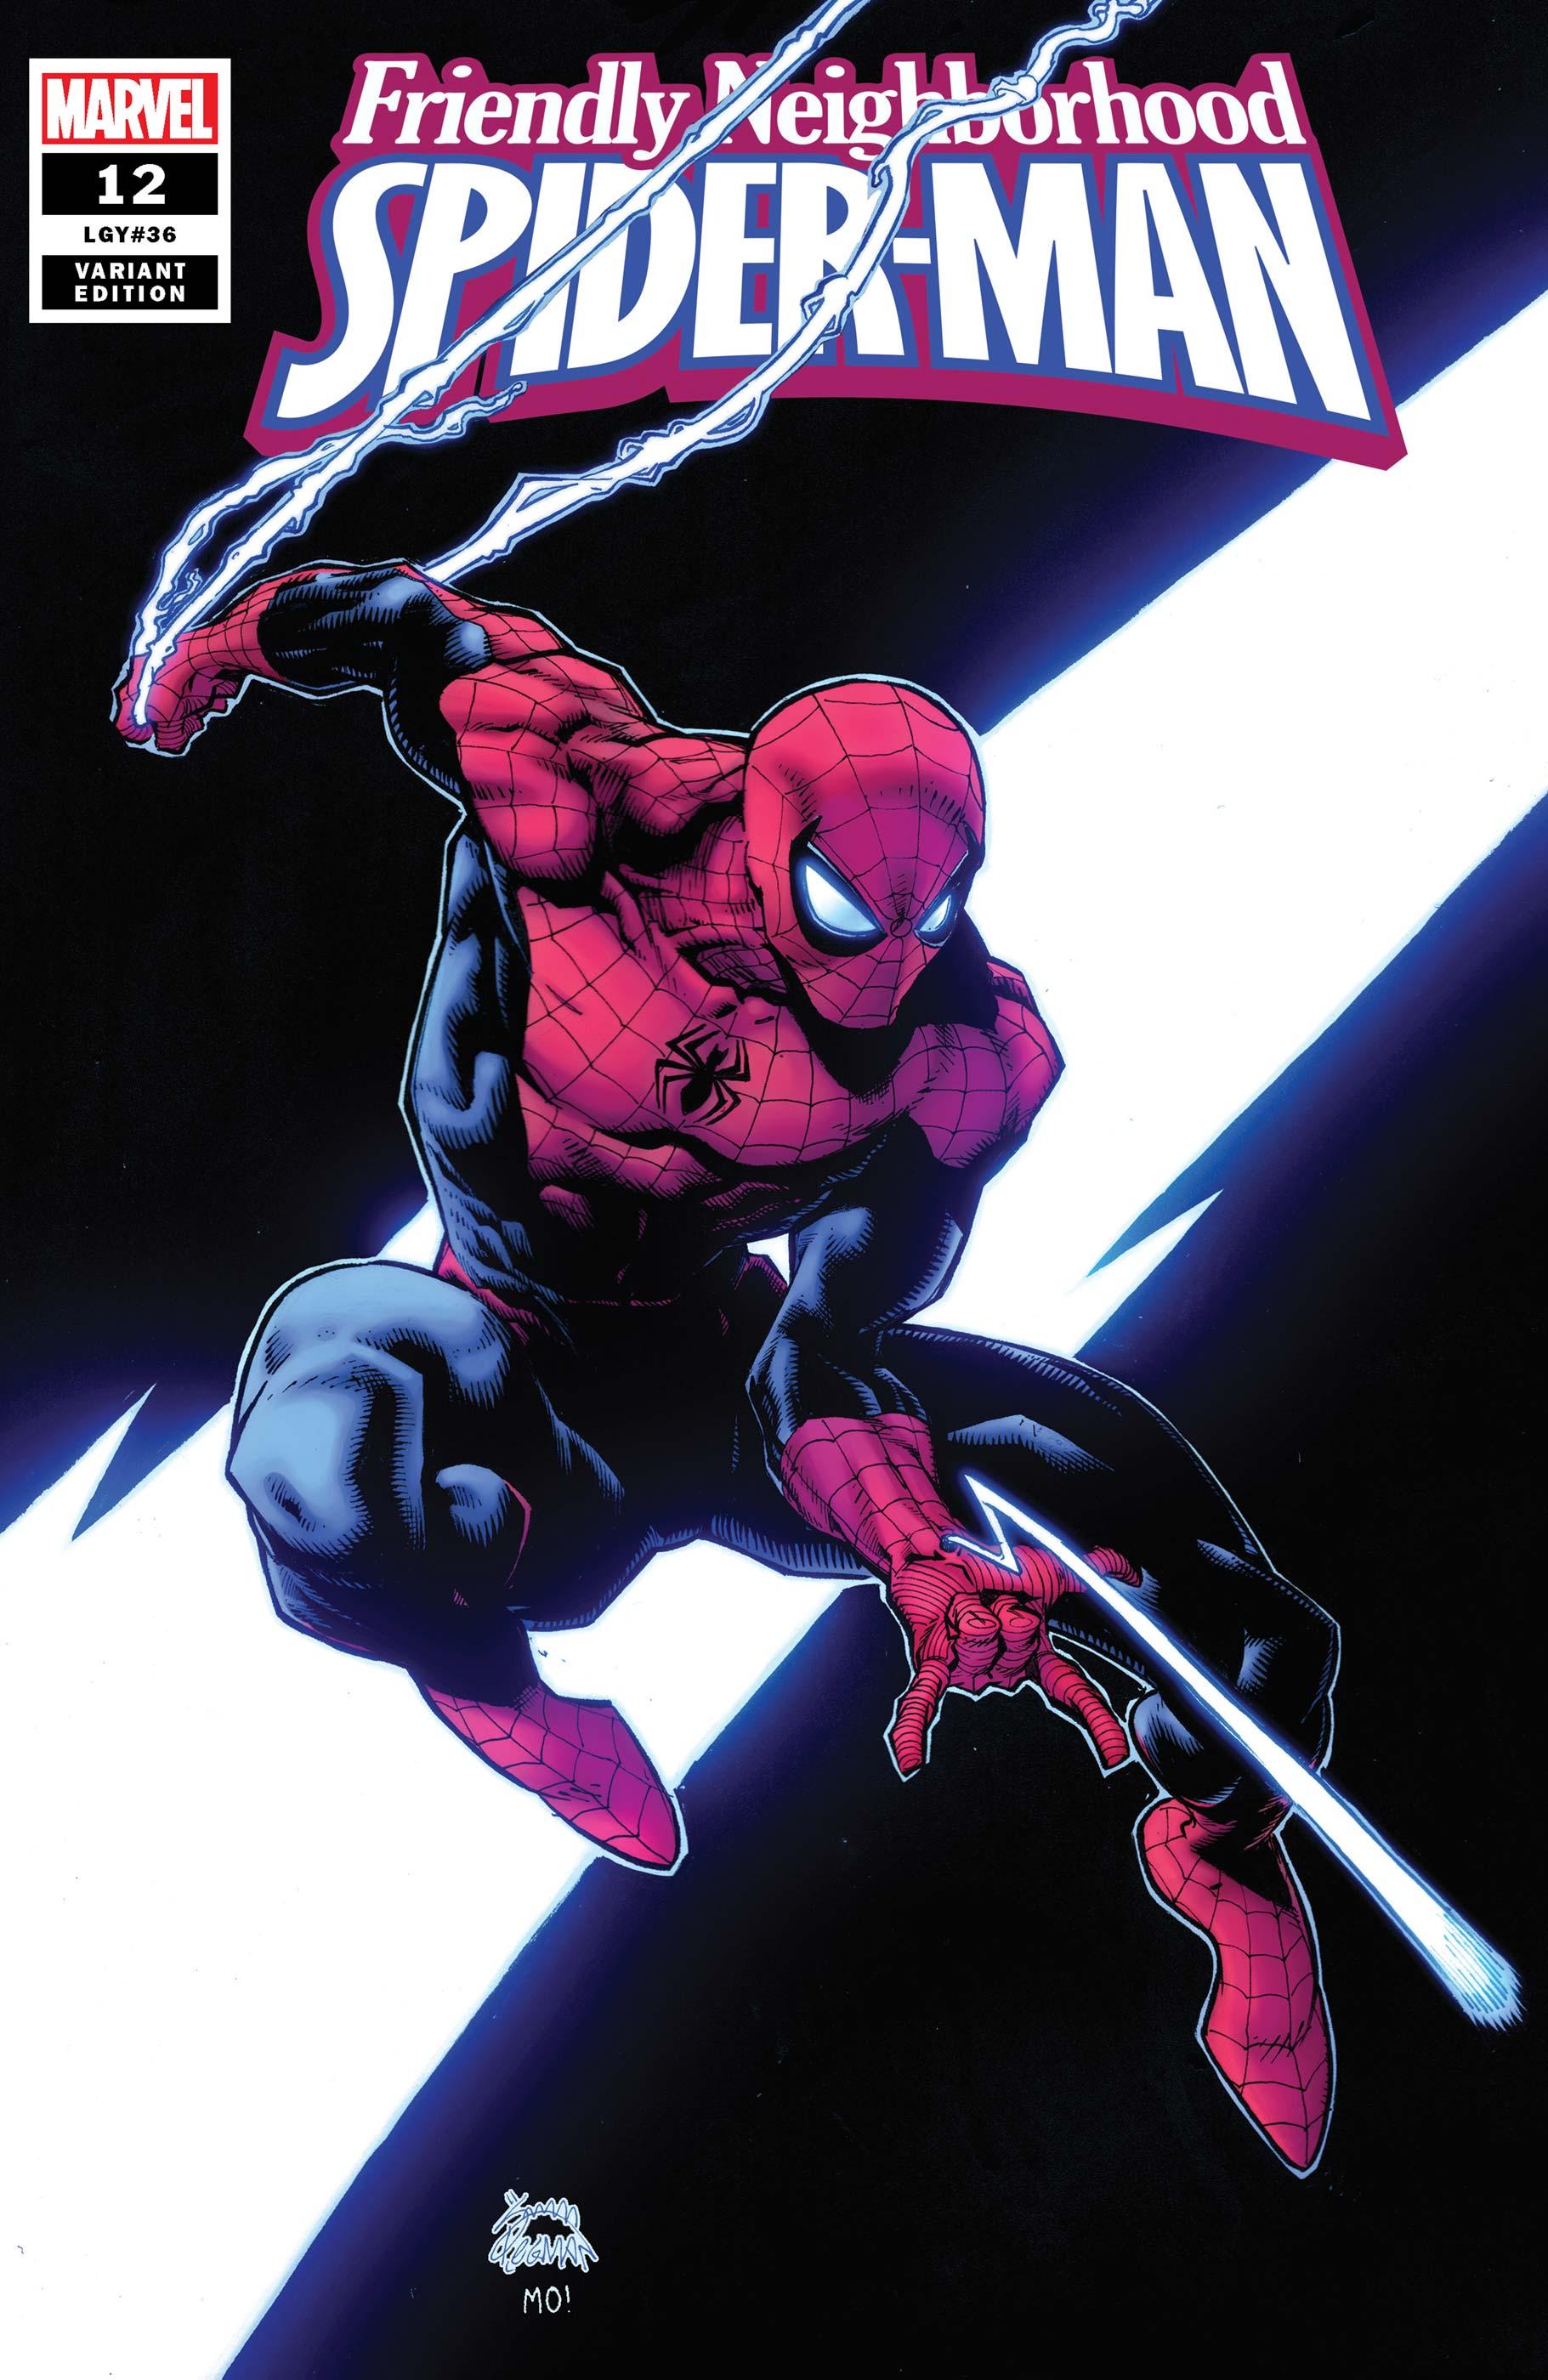 Friendly Neighborhood Spider-Man (2019) #12 (Variant)